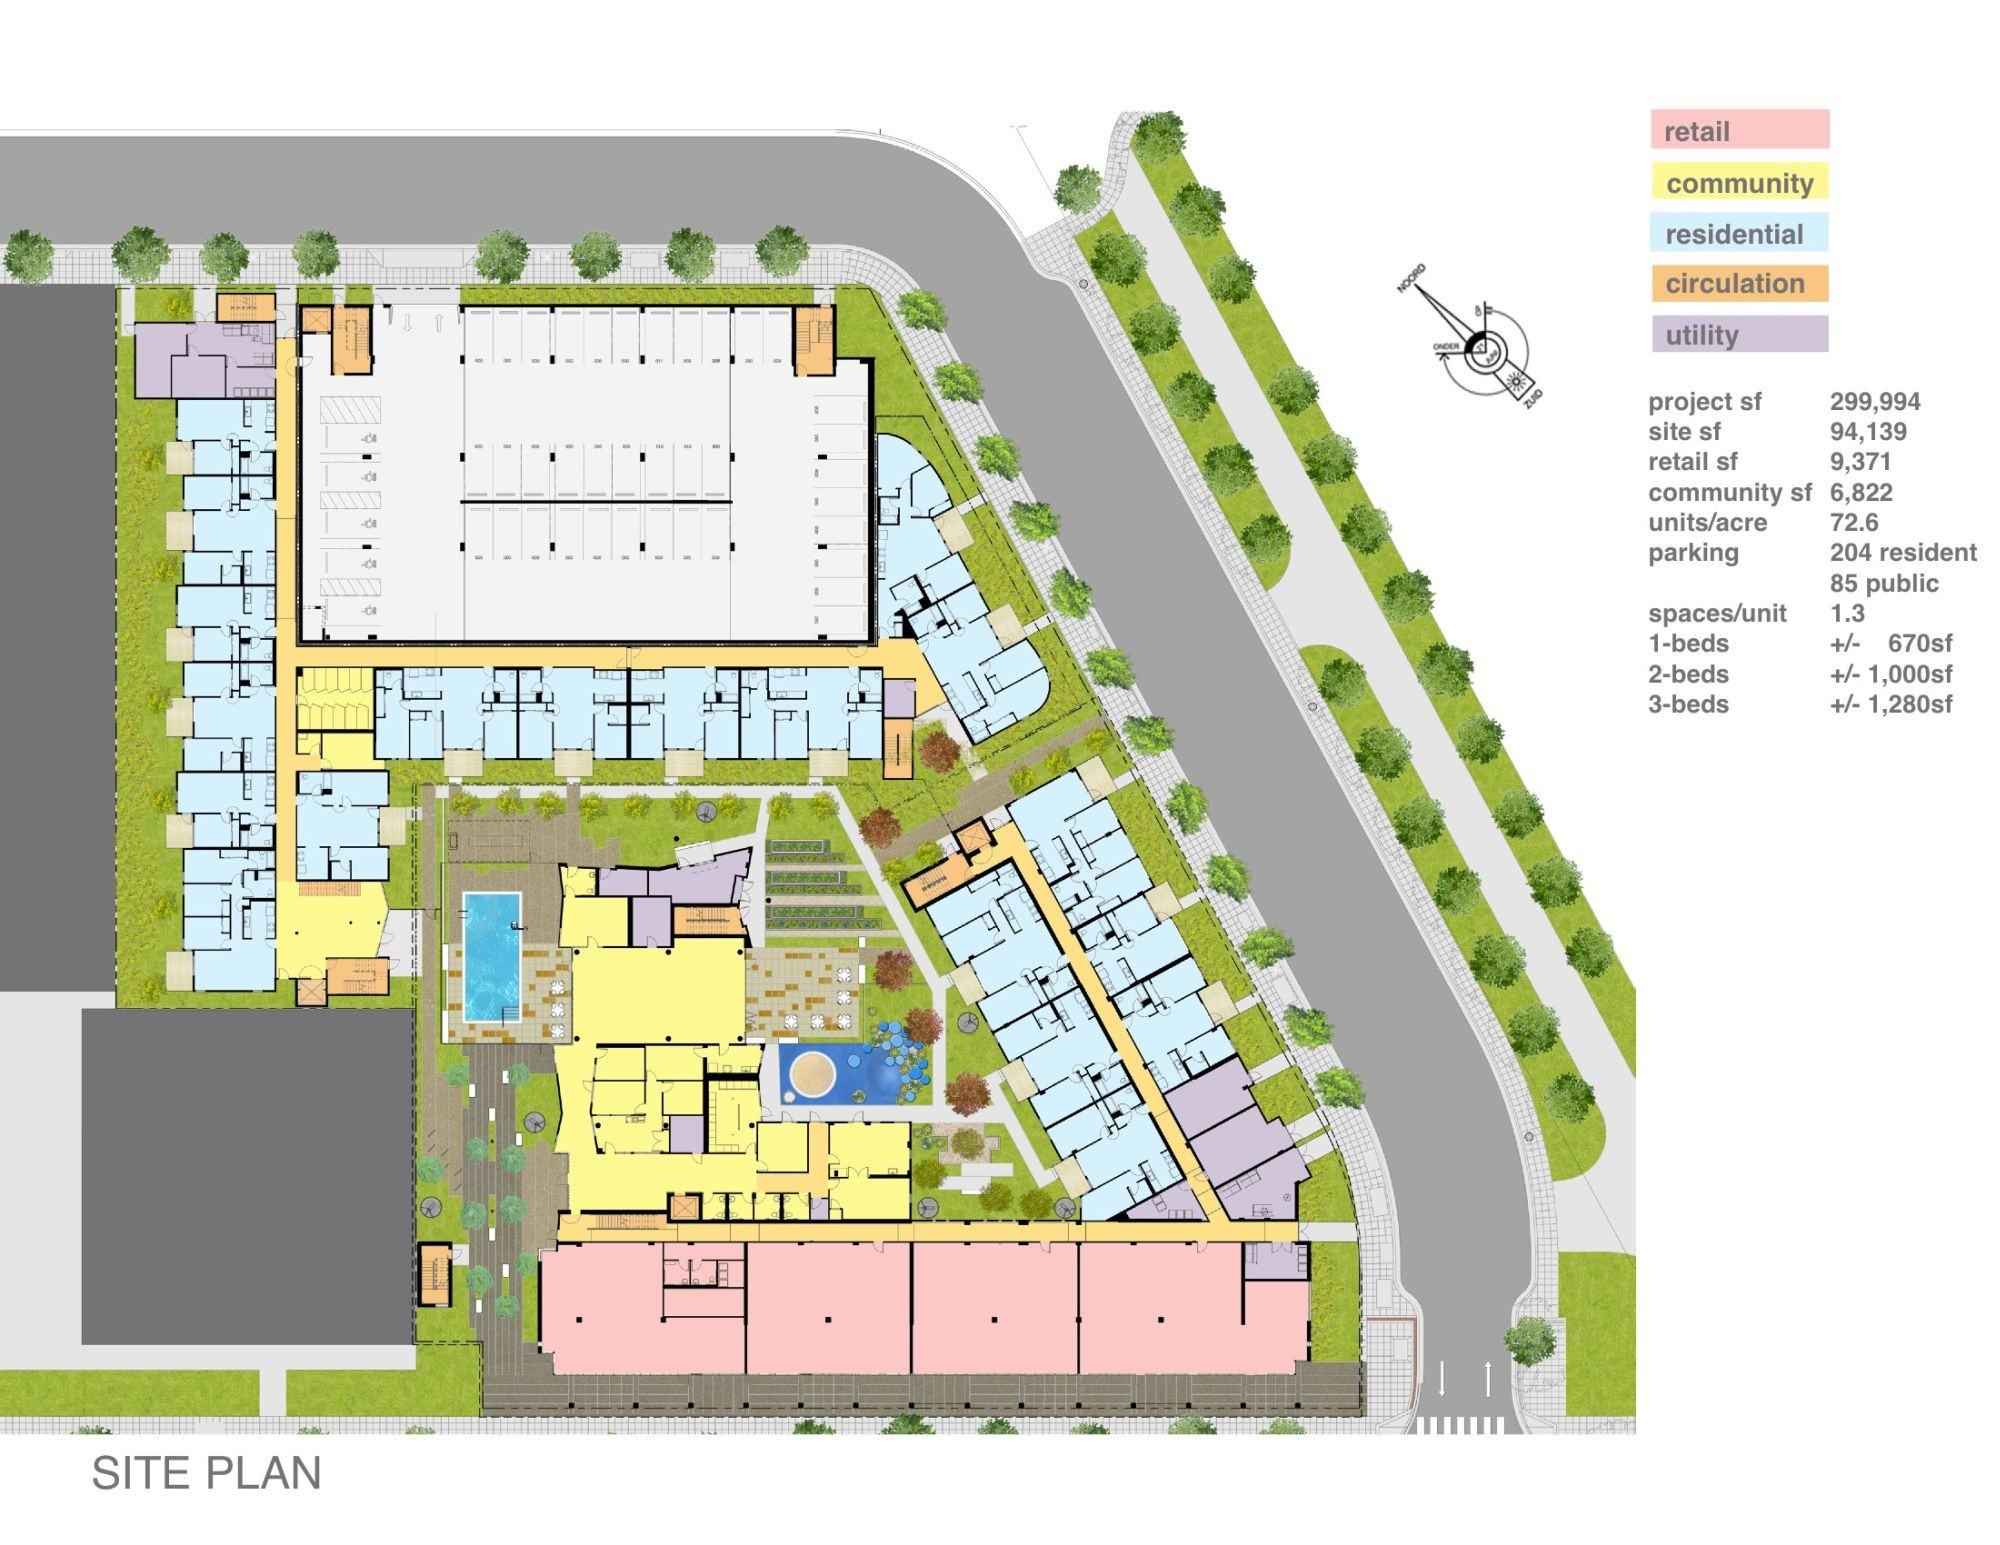 Townhome Floor Plan Galer 237 A De Estaci 243 N De Centro Familiar De Viviendas